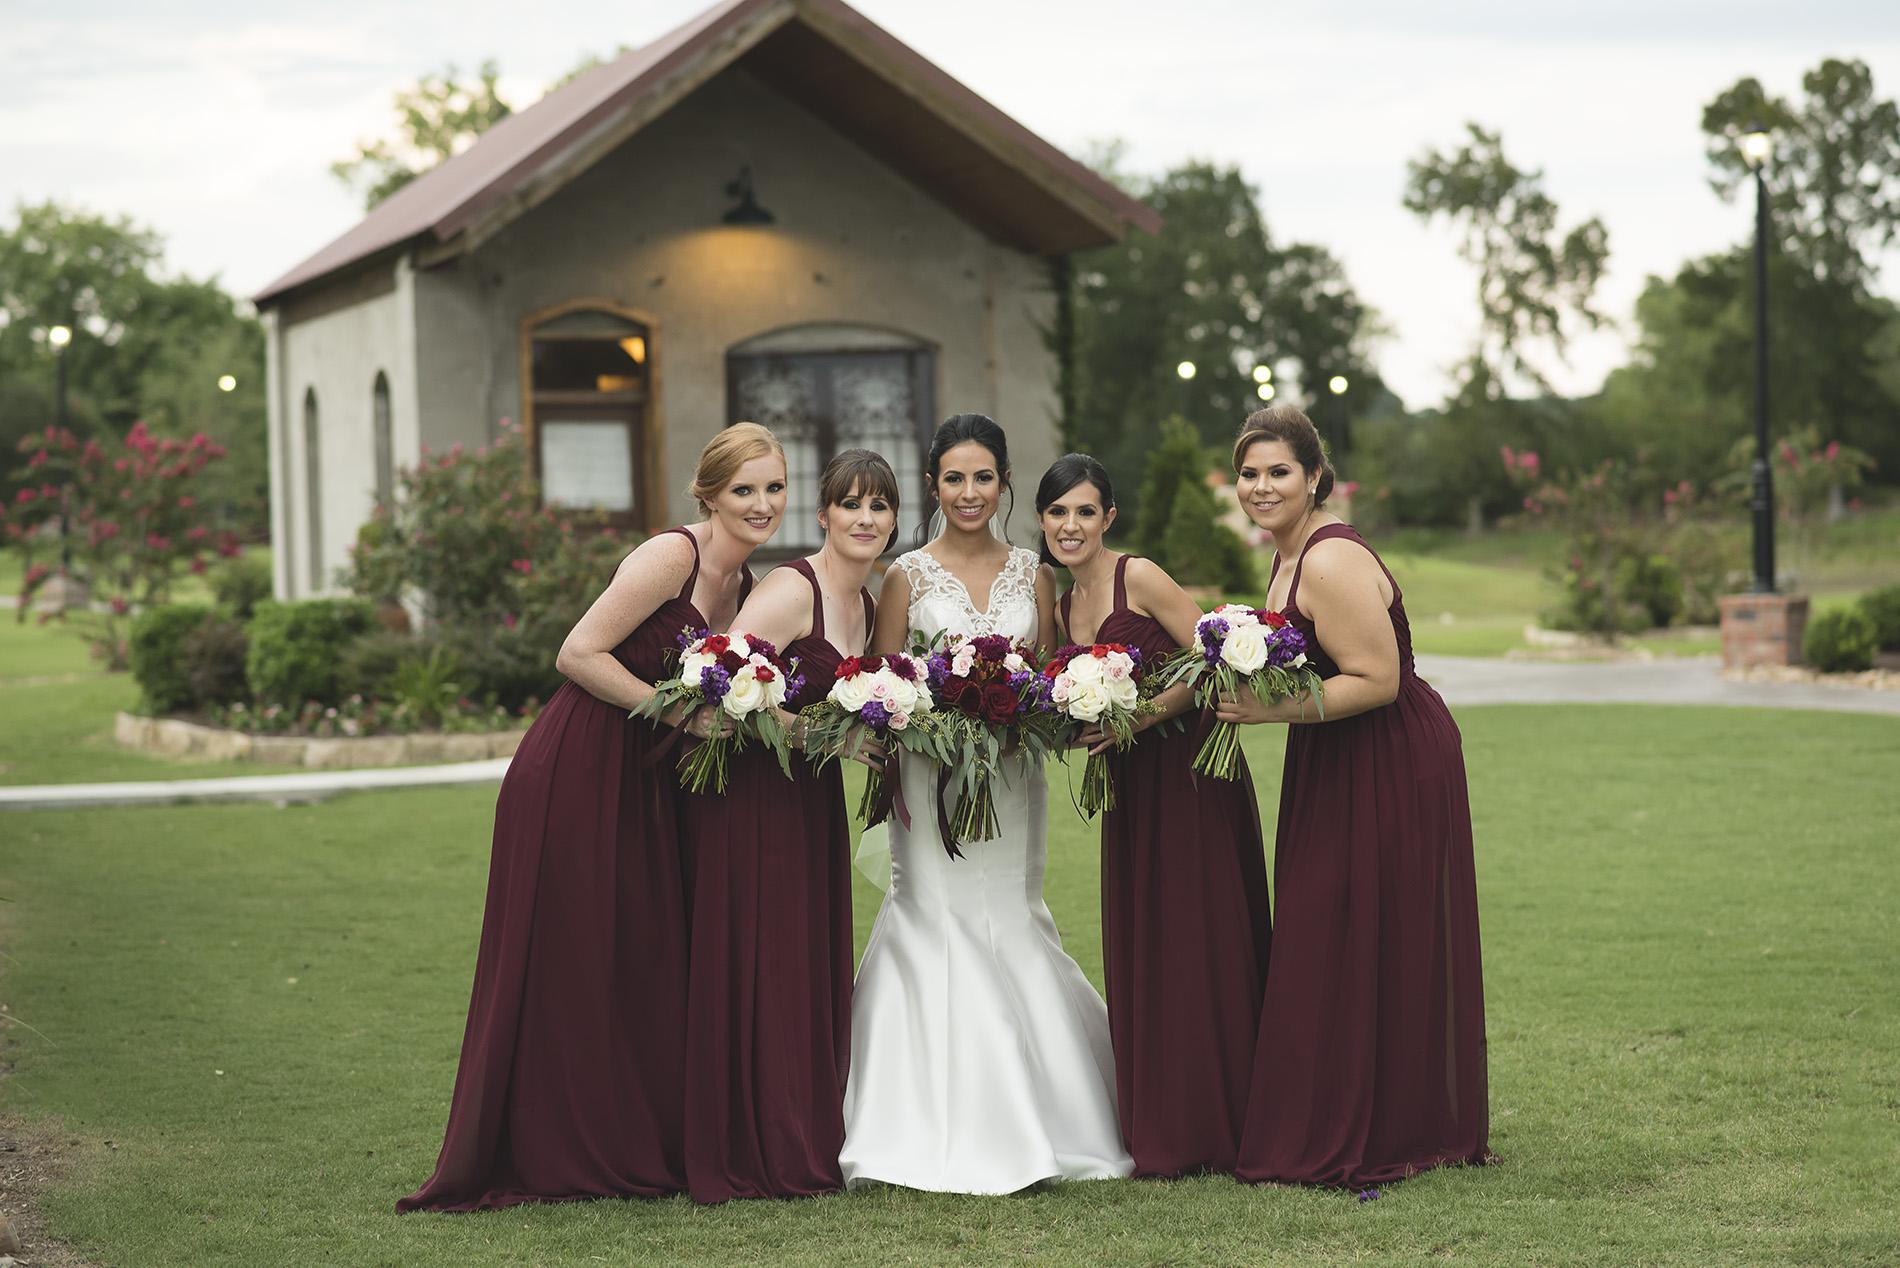 Houston-venue-Olde-Dobbin-Station-Romantic-Classic-Wedding-Photographer-085.jpg